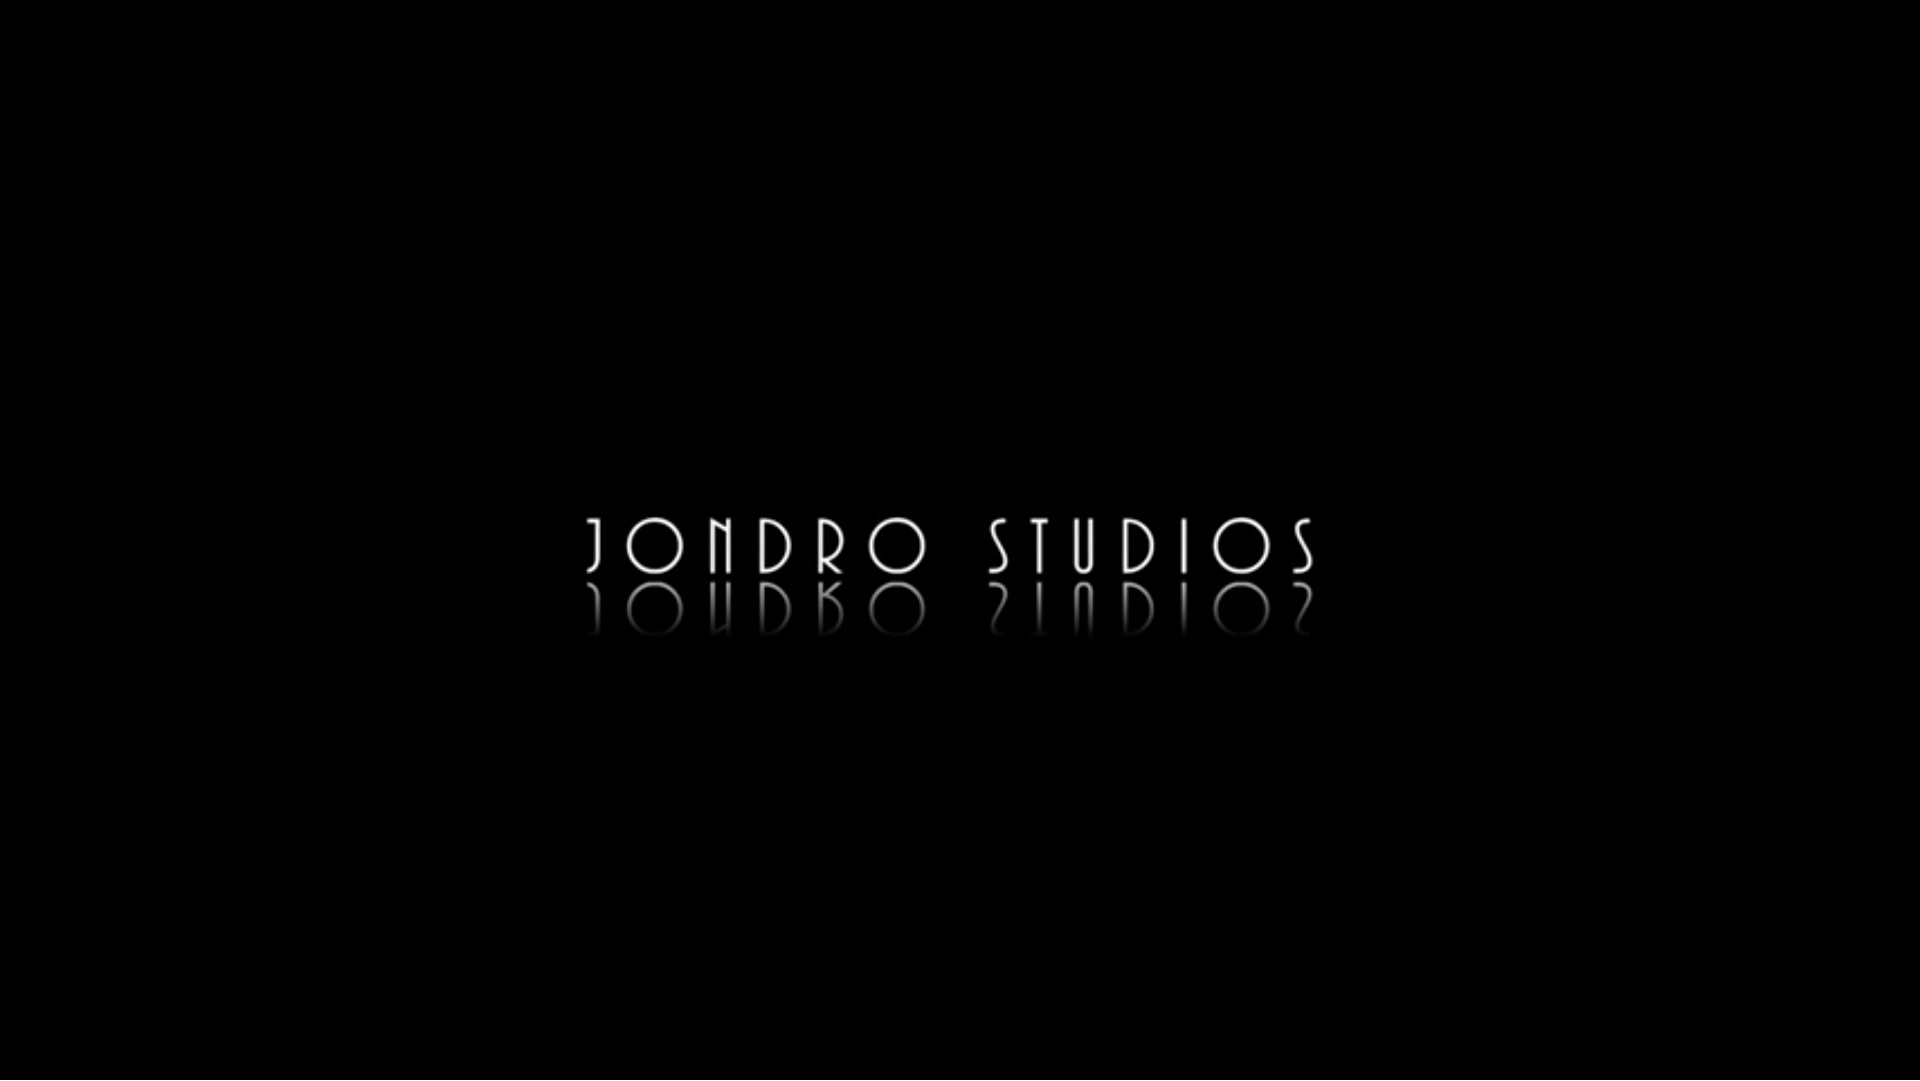 Jondro Studios media